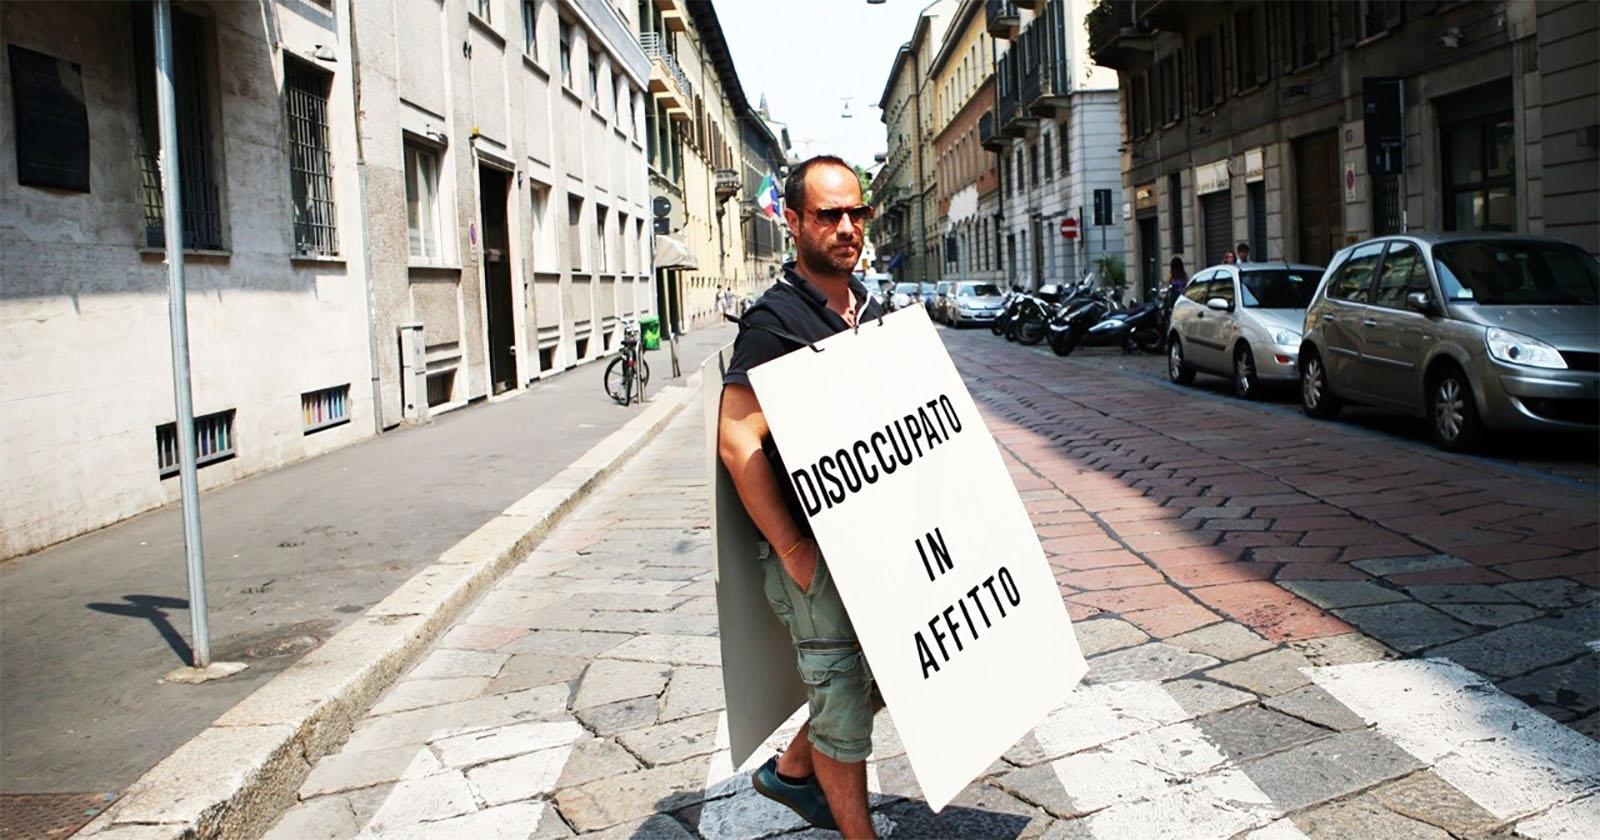 Disoccupato_in_affitto_Film_Pietro_Mereu_Lavoro_Italia